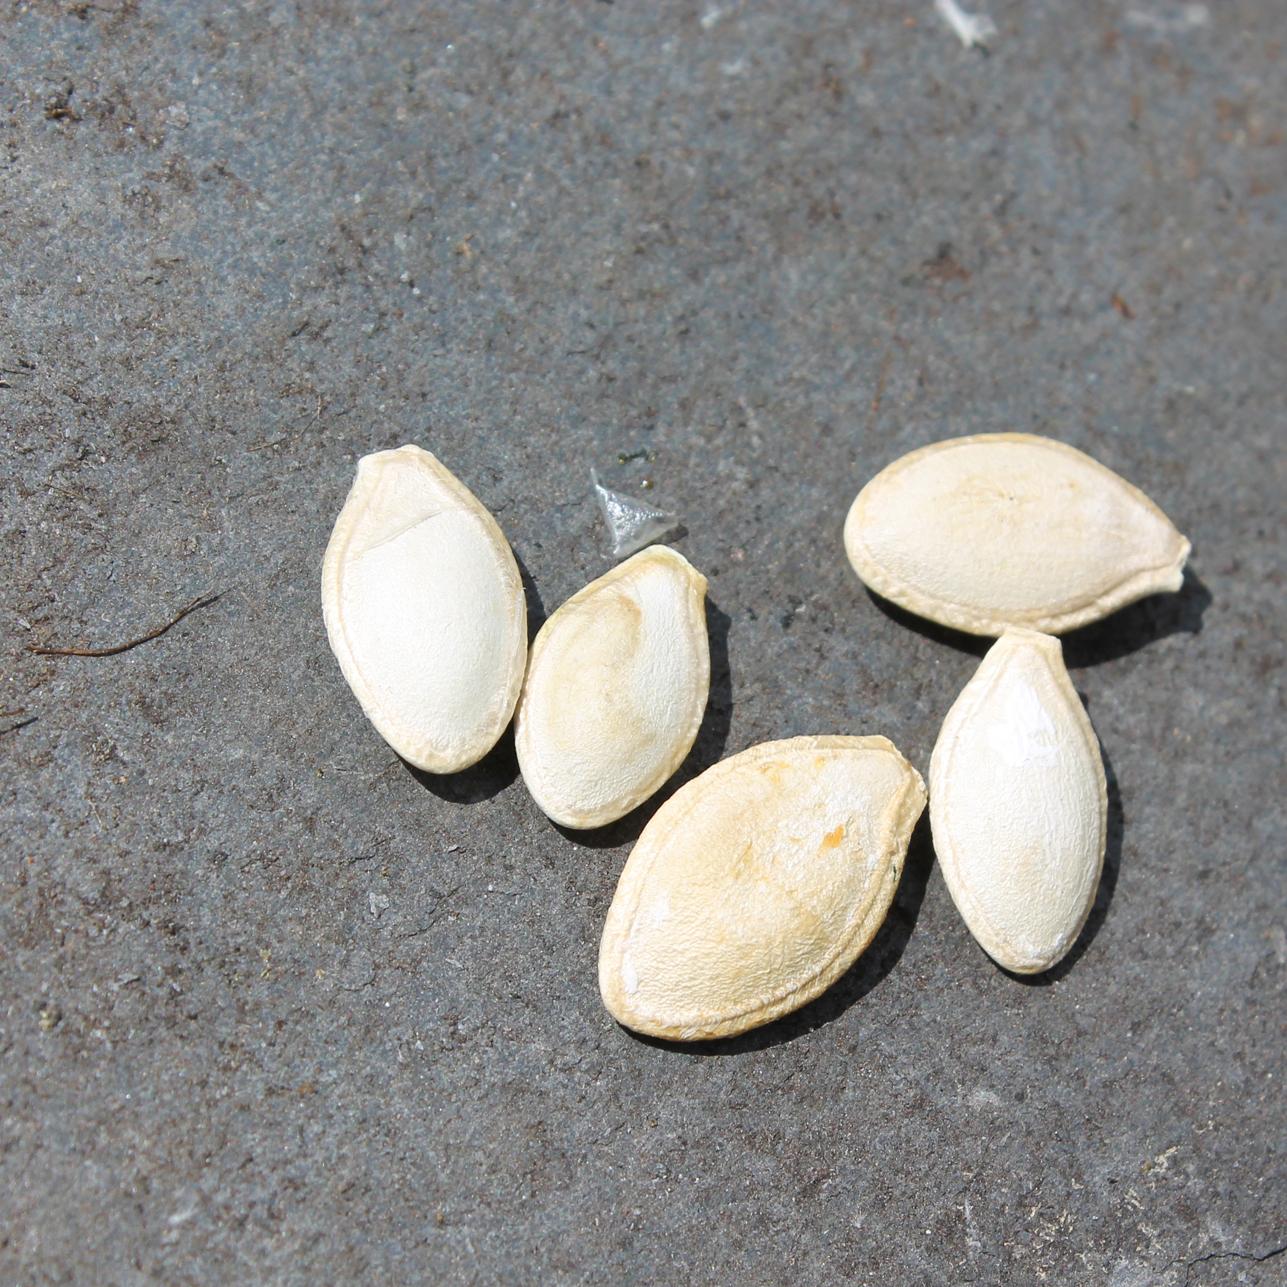 Zucchini-seeds